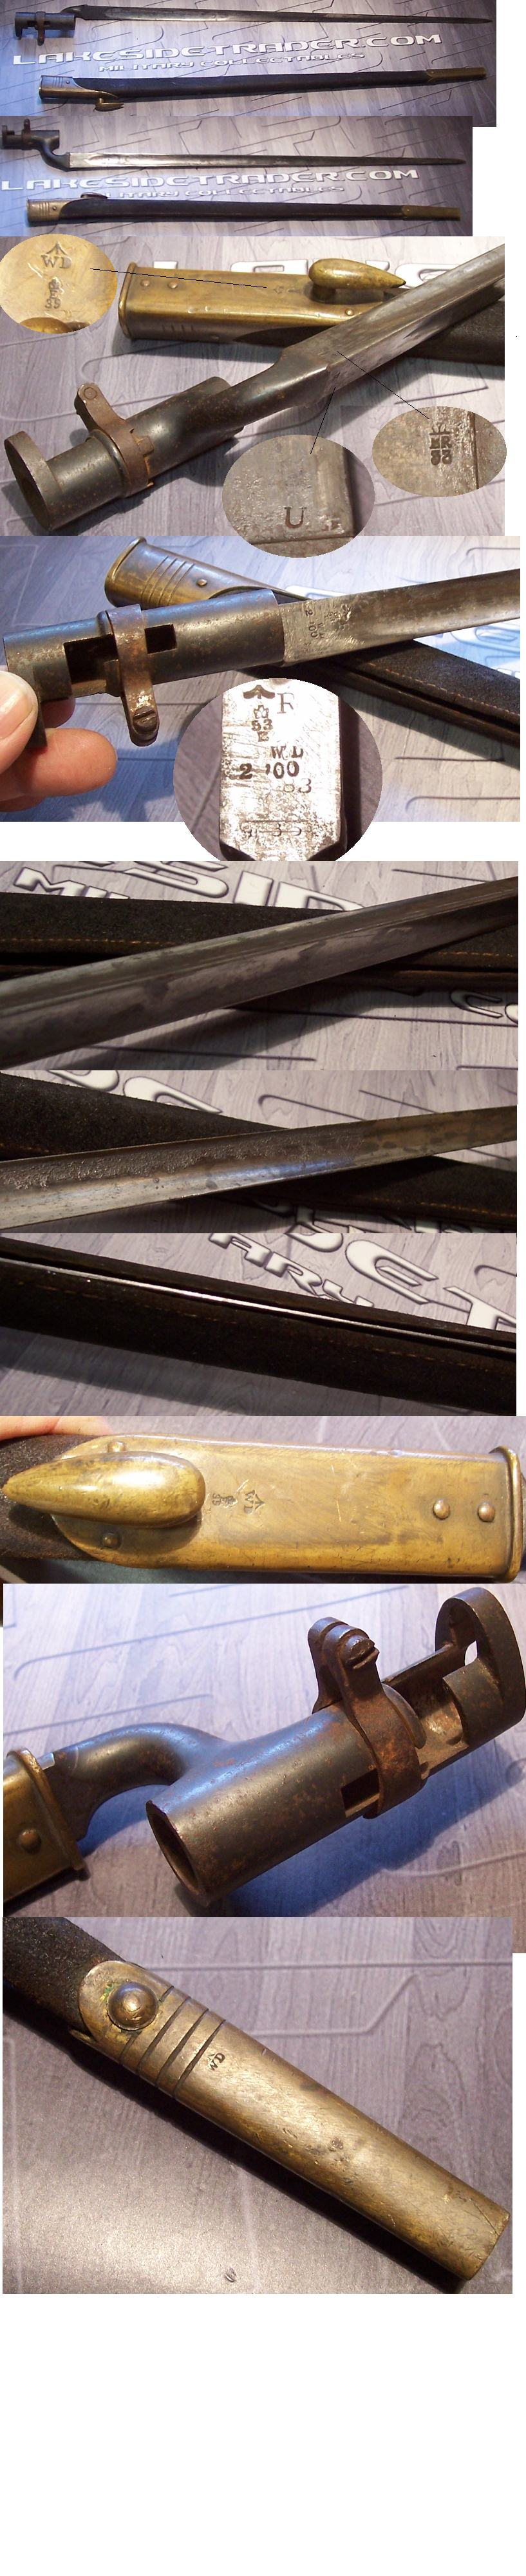 Pattern 1895 Martini-Henry Socket Bayonet